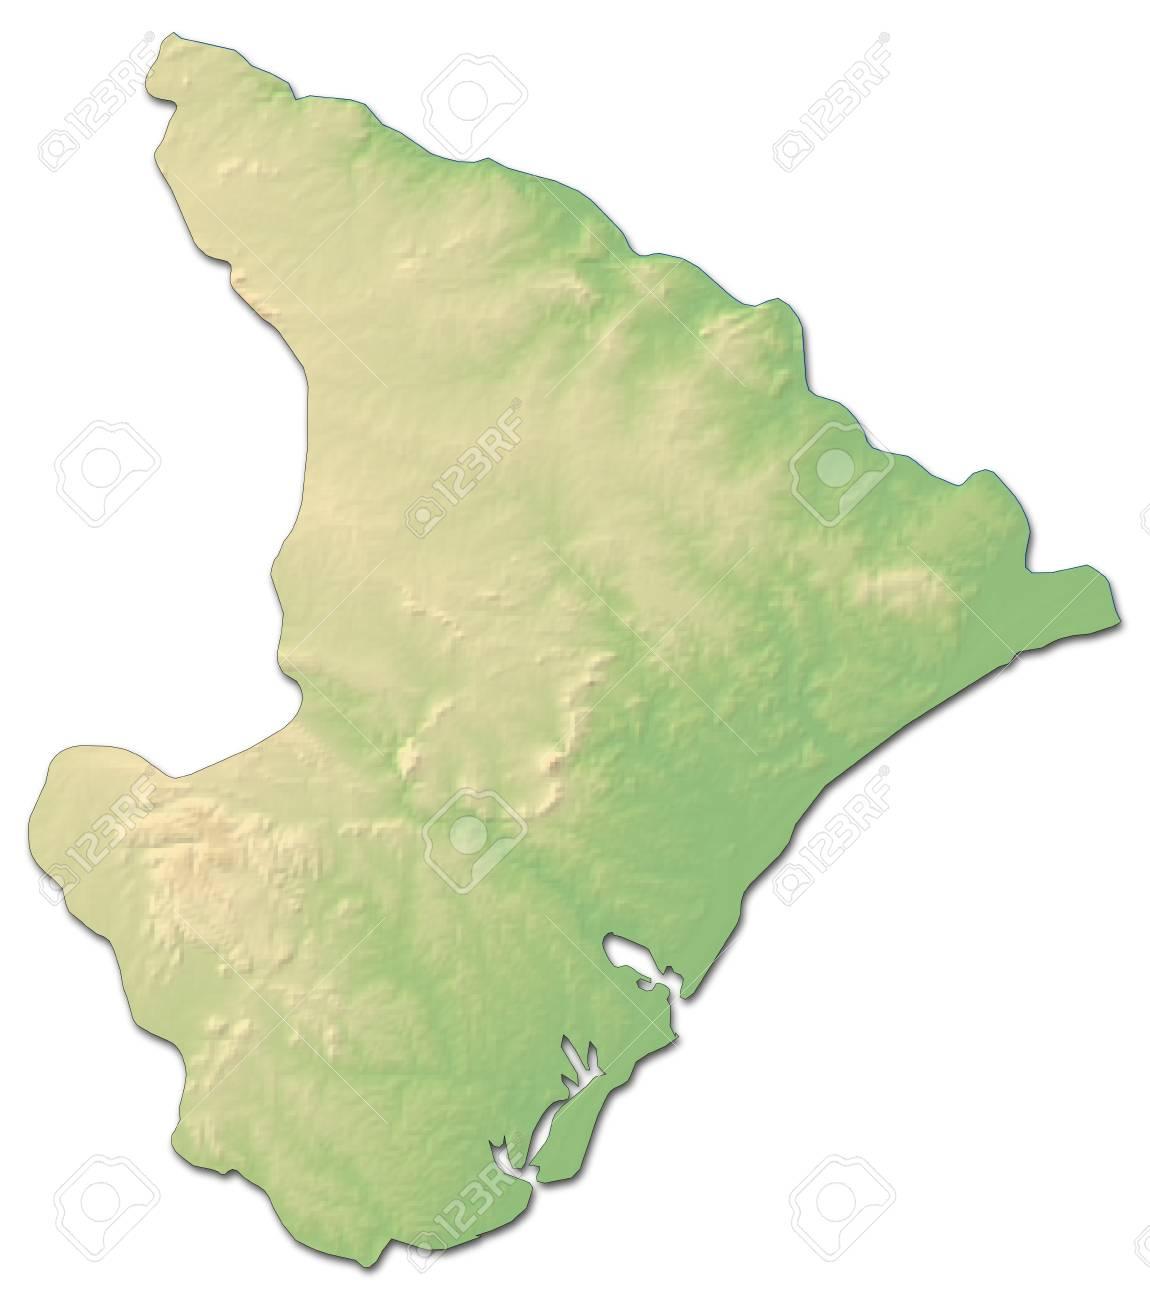 Carte Bresil Relief.Carte En Relief De Sergipe Province Du Bresil Avec Relief Ombrage